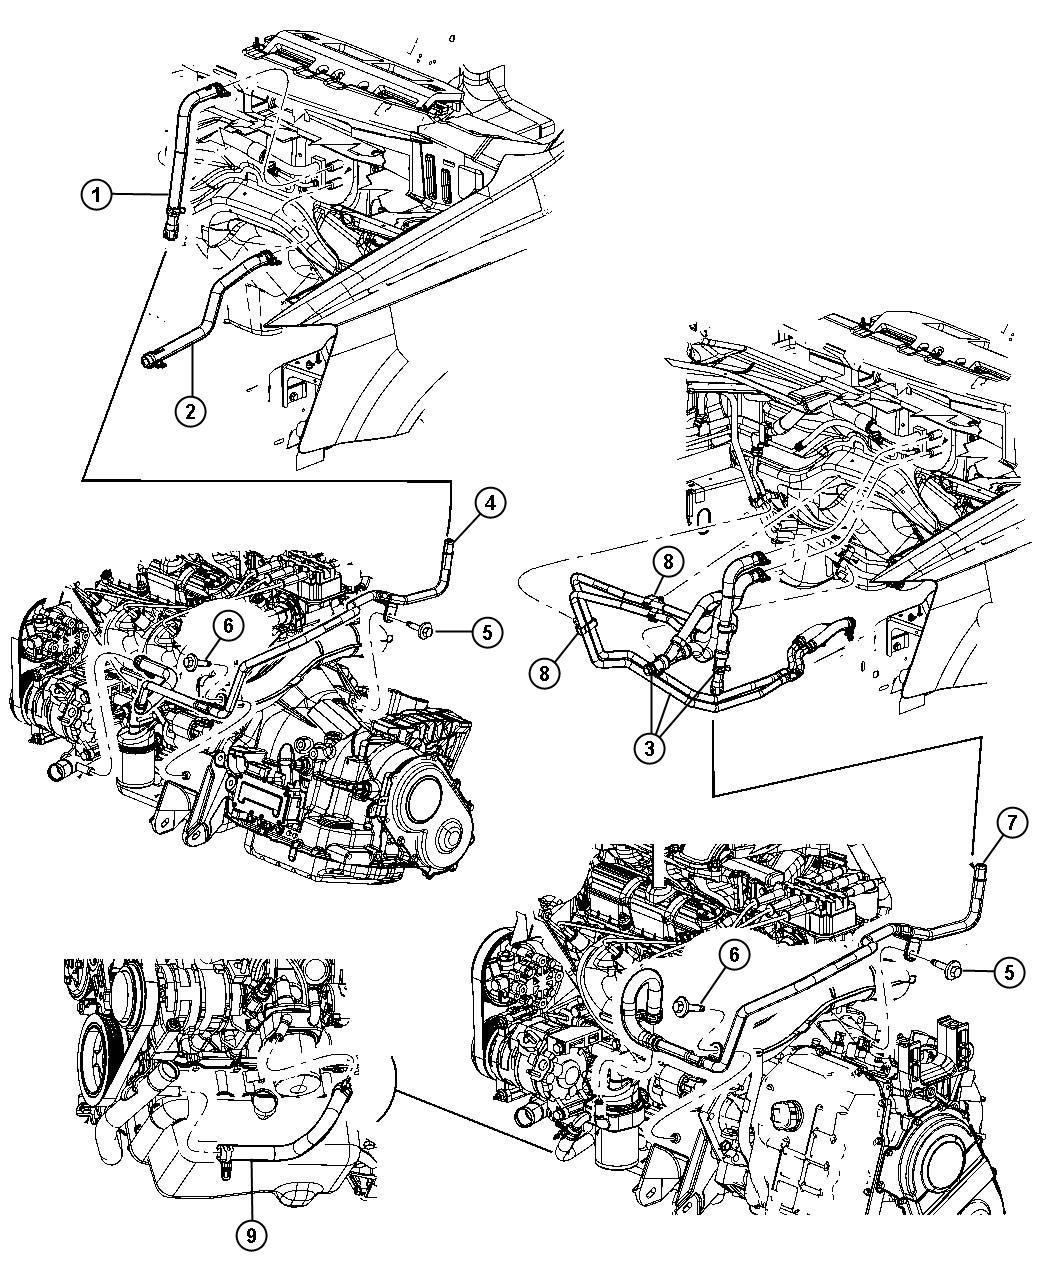 Dodge Grand Caravan Used for: HOSE AND TUBE. Heater Return